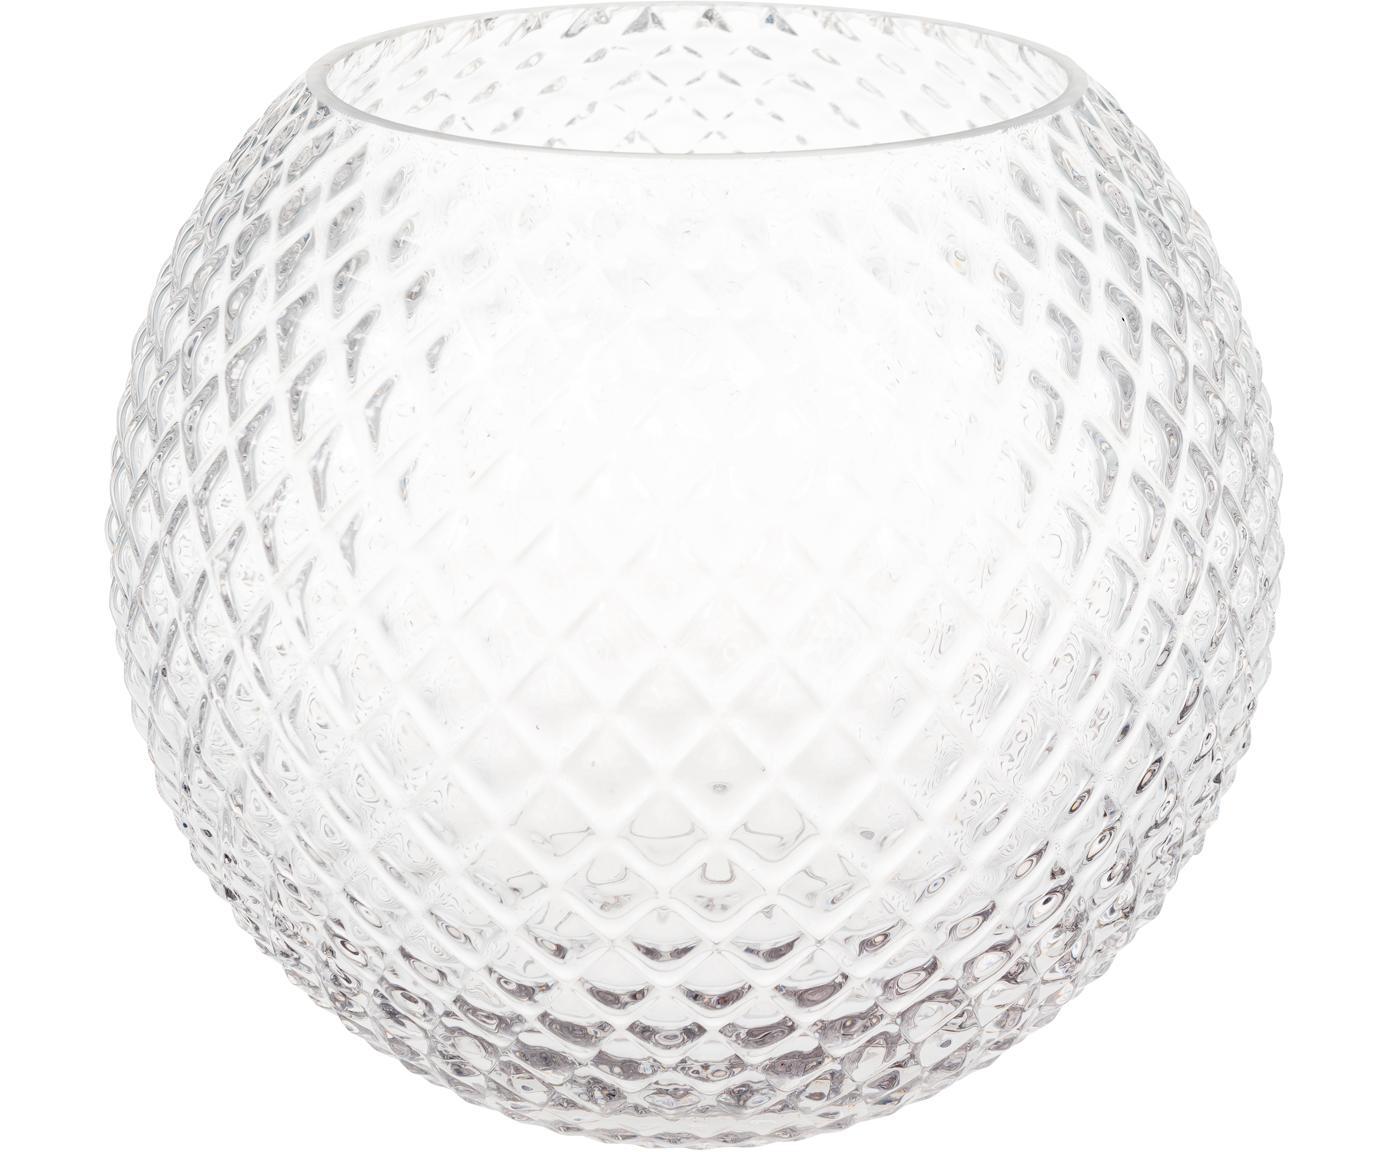 Glazen vaas Ilse, Glas, Transparant, Ø 23 x H 19 cm